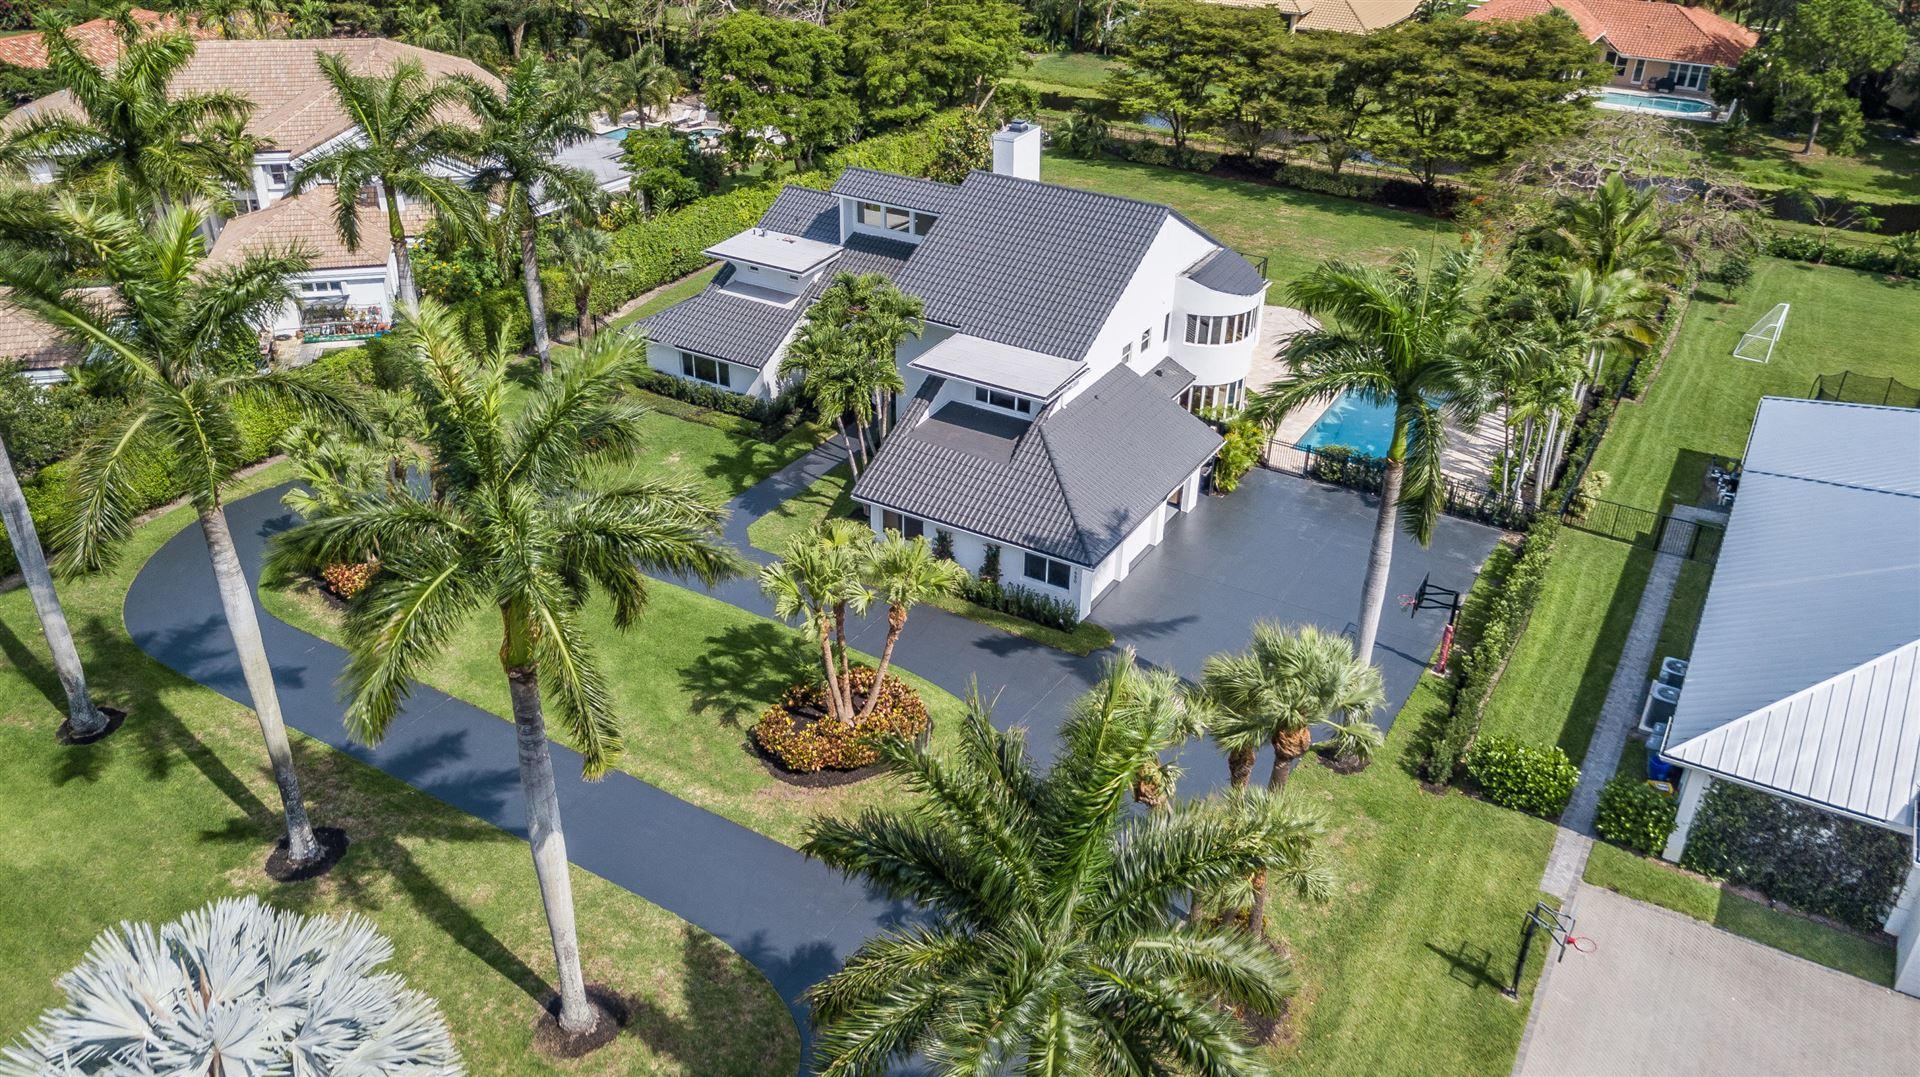 17680 Fieldbrook Circle N, Boca Raton, FL 33496 - #: RX-10619253